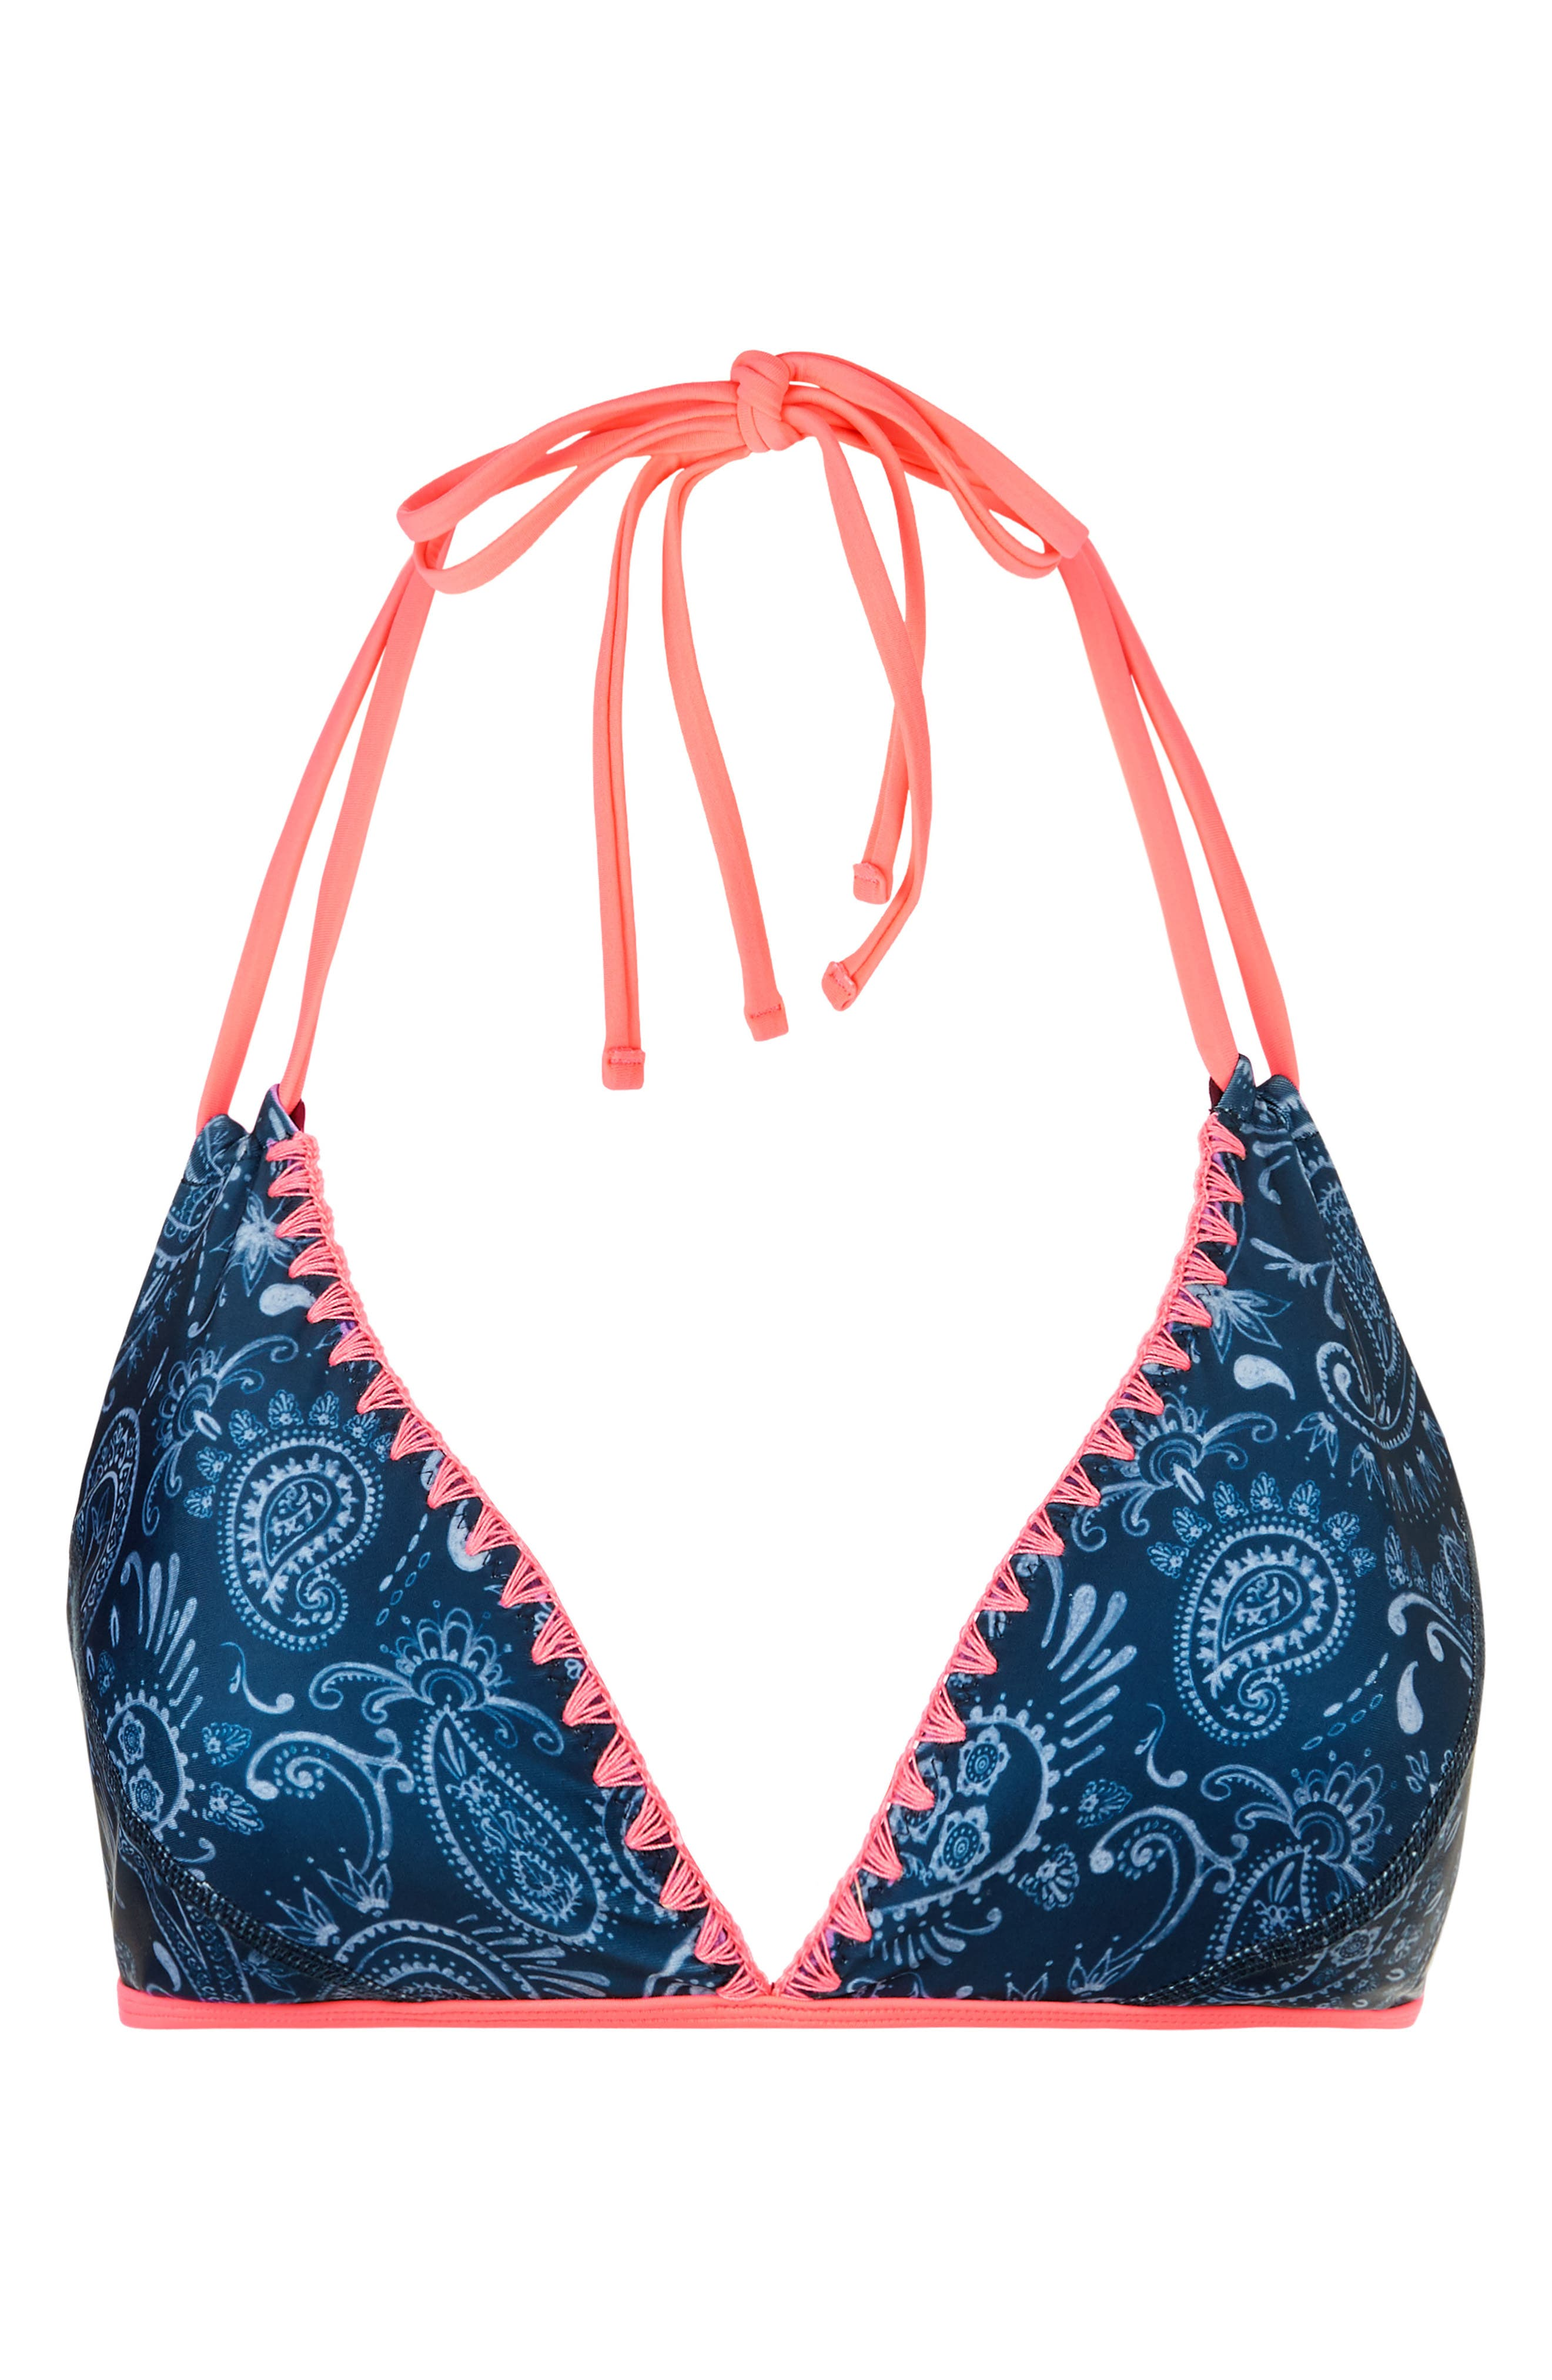 Purity Reversible Bikini Top,                             Alternate thumbnail 6, color,                             Printed/ Oxblood